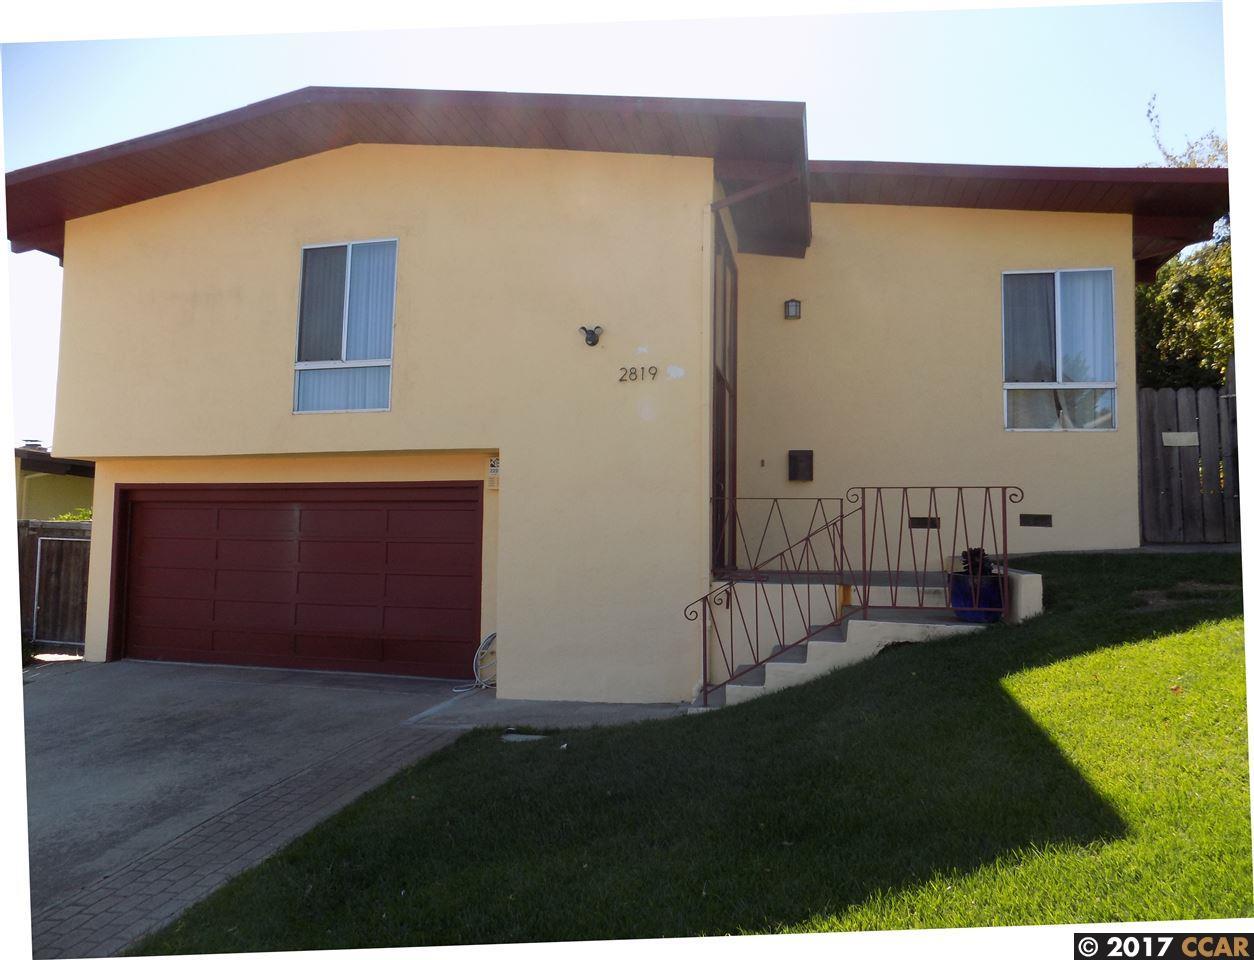 2819 MOYERS RD., RICHMOND, CA 94806